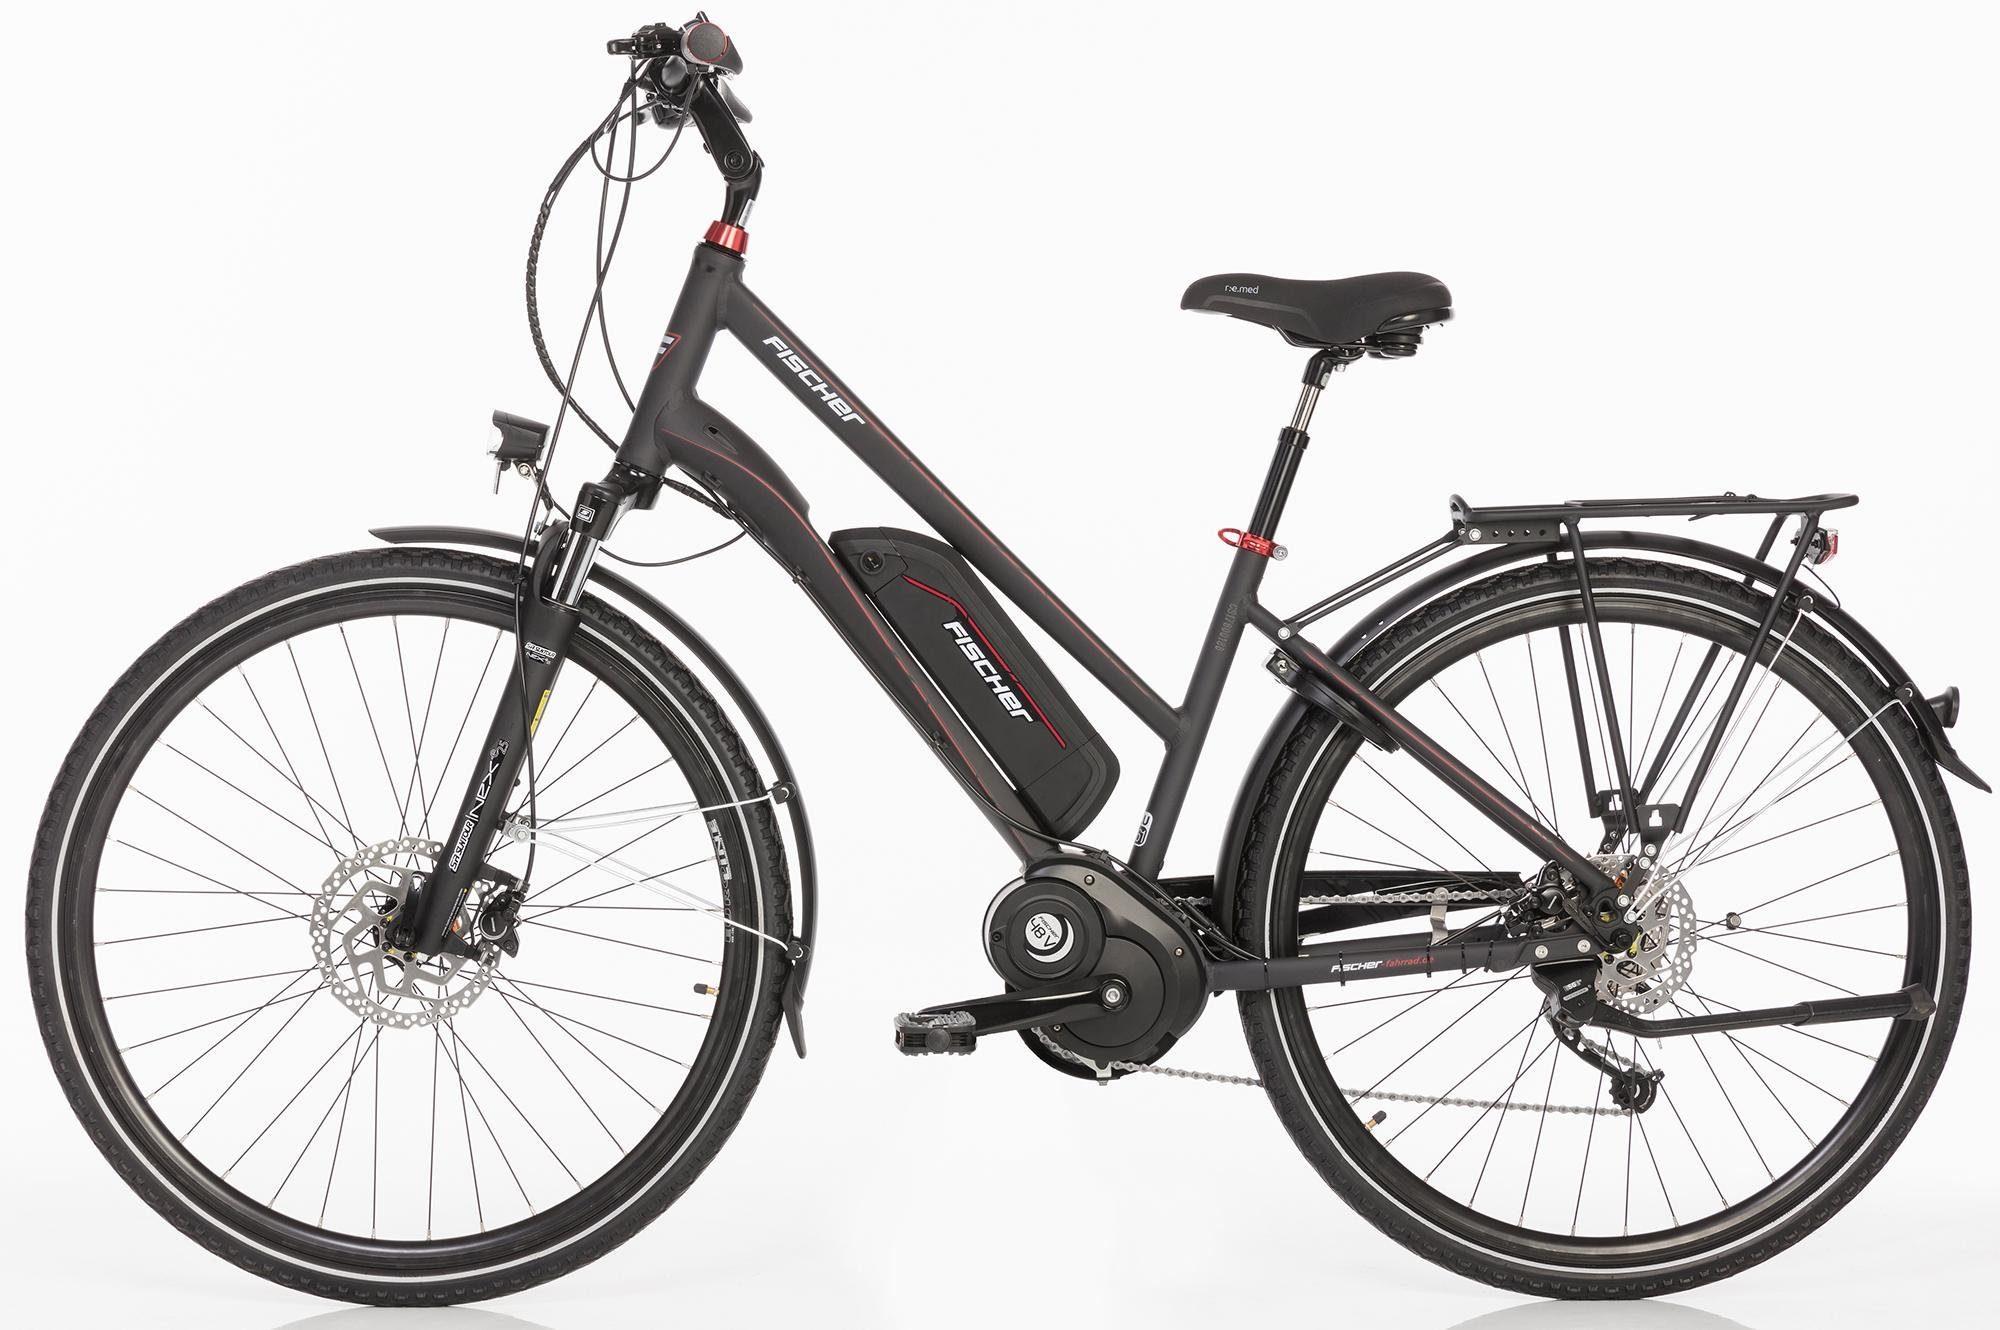 FISCHER Damen Trekking E-Bike, 48 V/250 W Mittelm., 28 Z., 9-Gang-Shimano Schaltwerk, »ETD 1820 Ready«